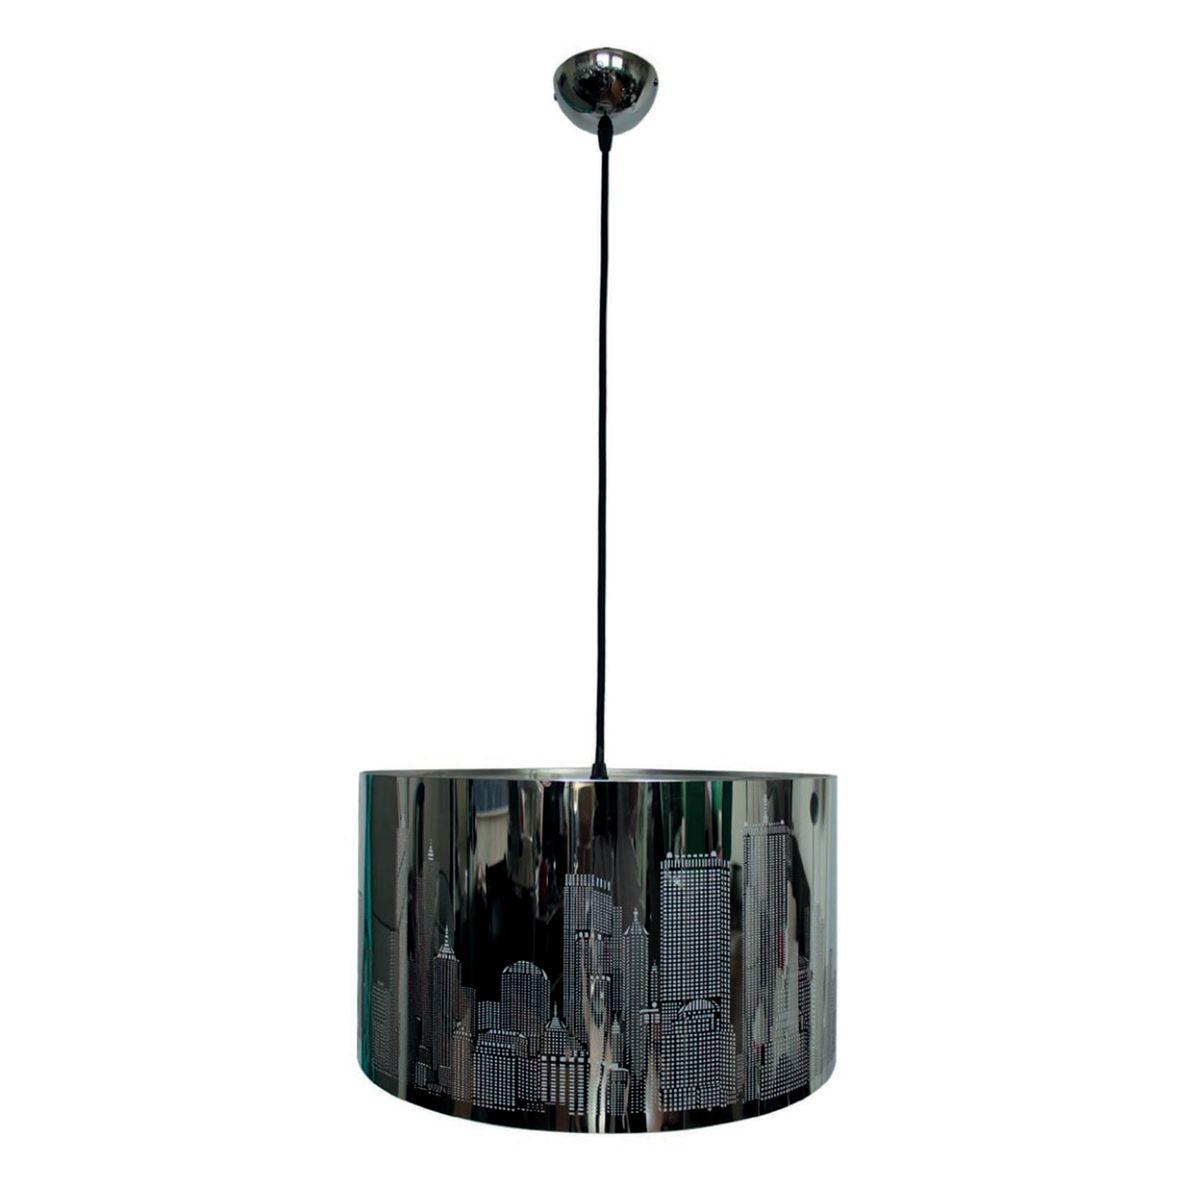 Leroy merlin lampade da soffitto beautiful da tavolo callas with leroy merlin lampade da - Cappelli per lampade da tavolo ...